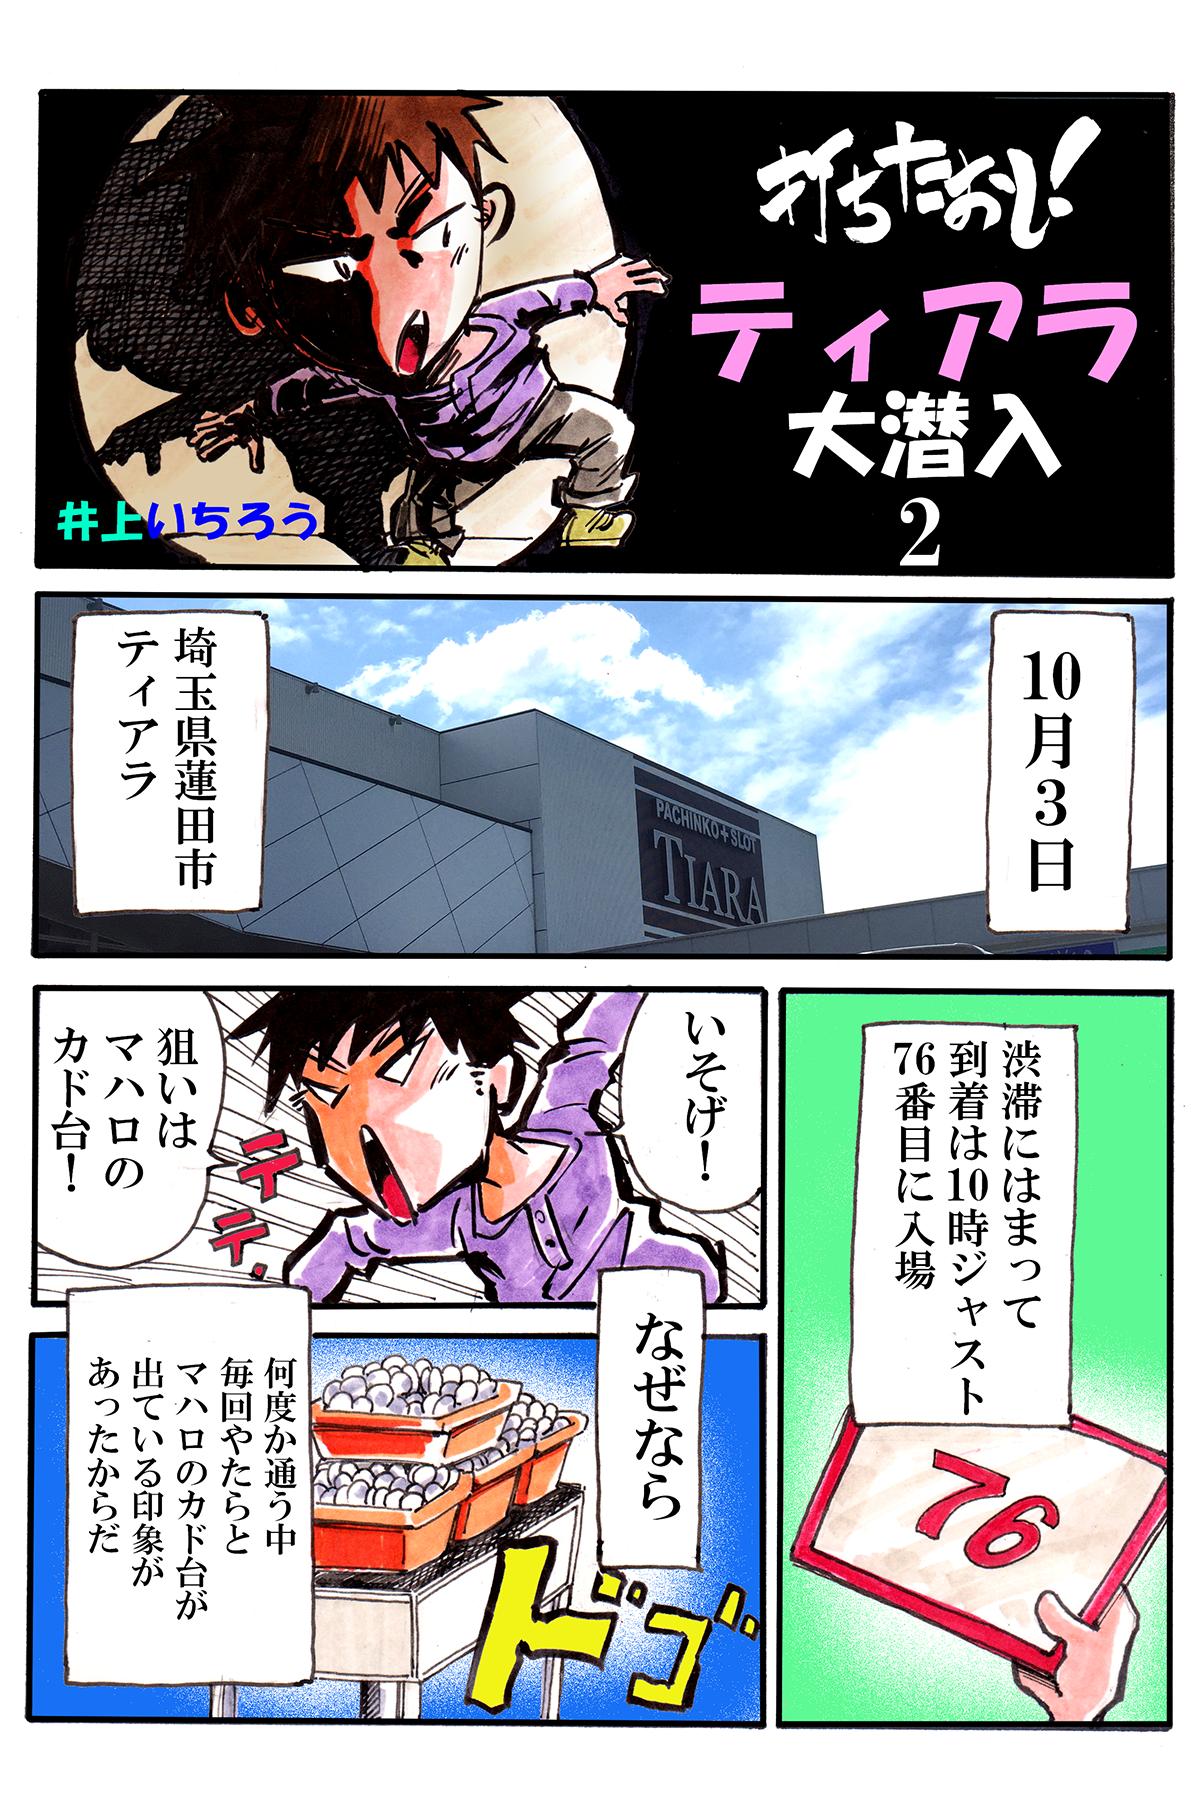 vol.2-1ティアラ大潜入